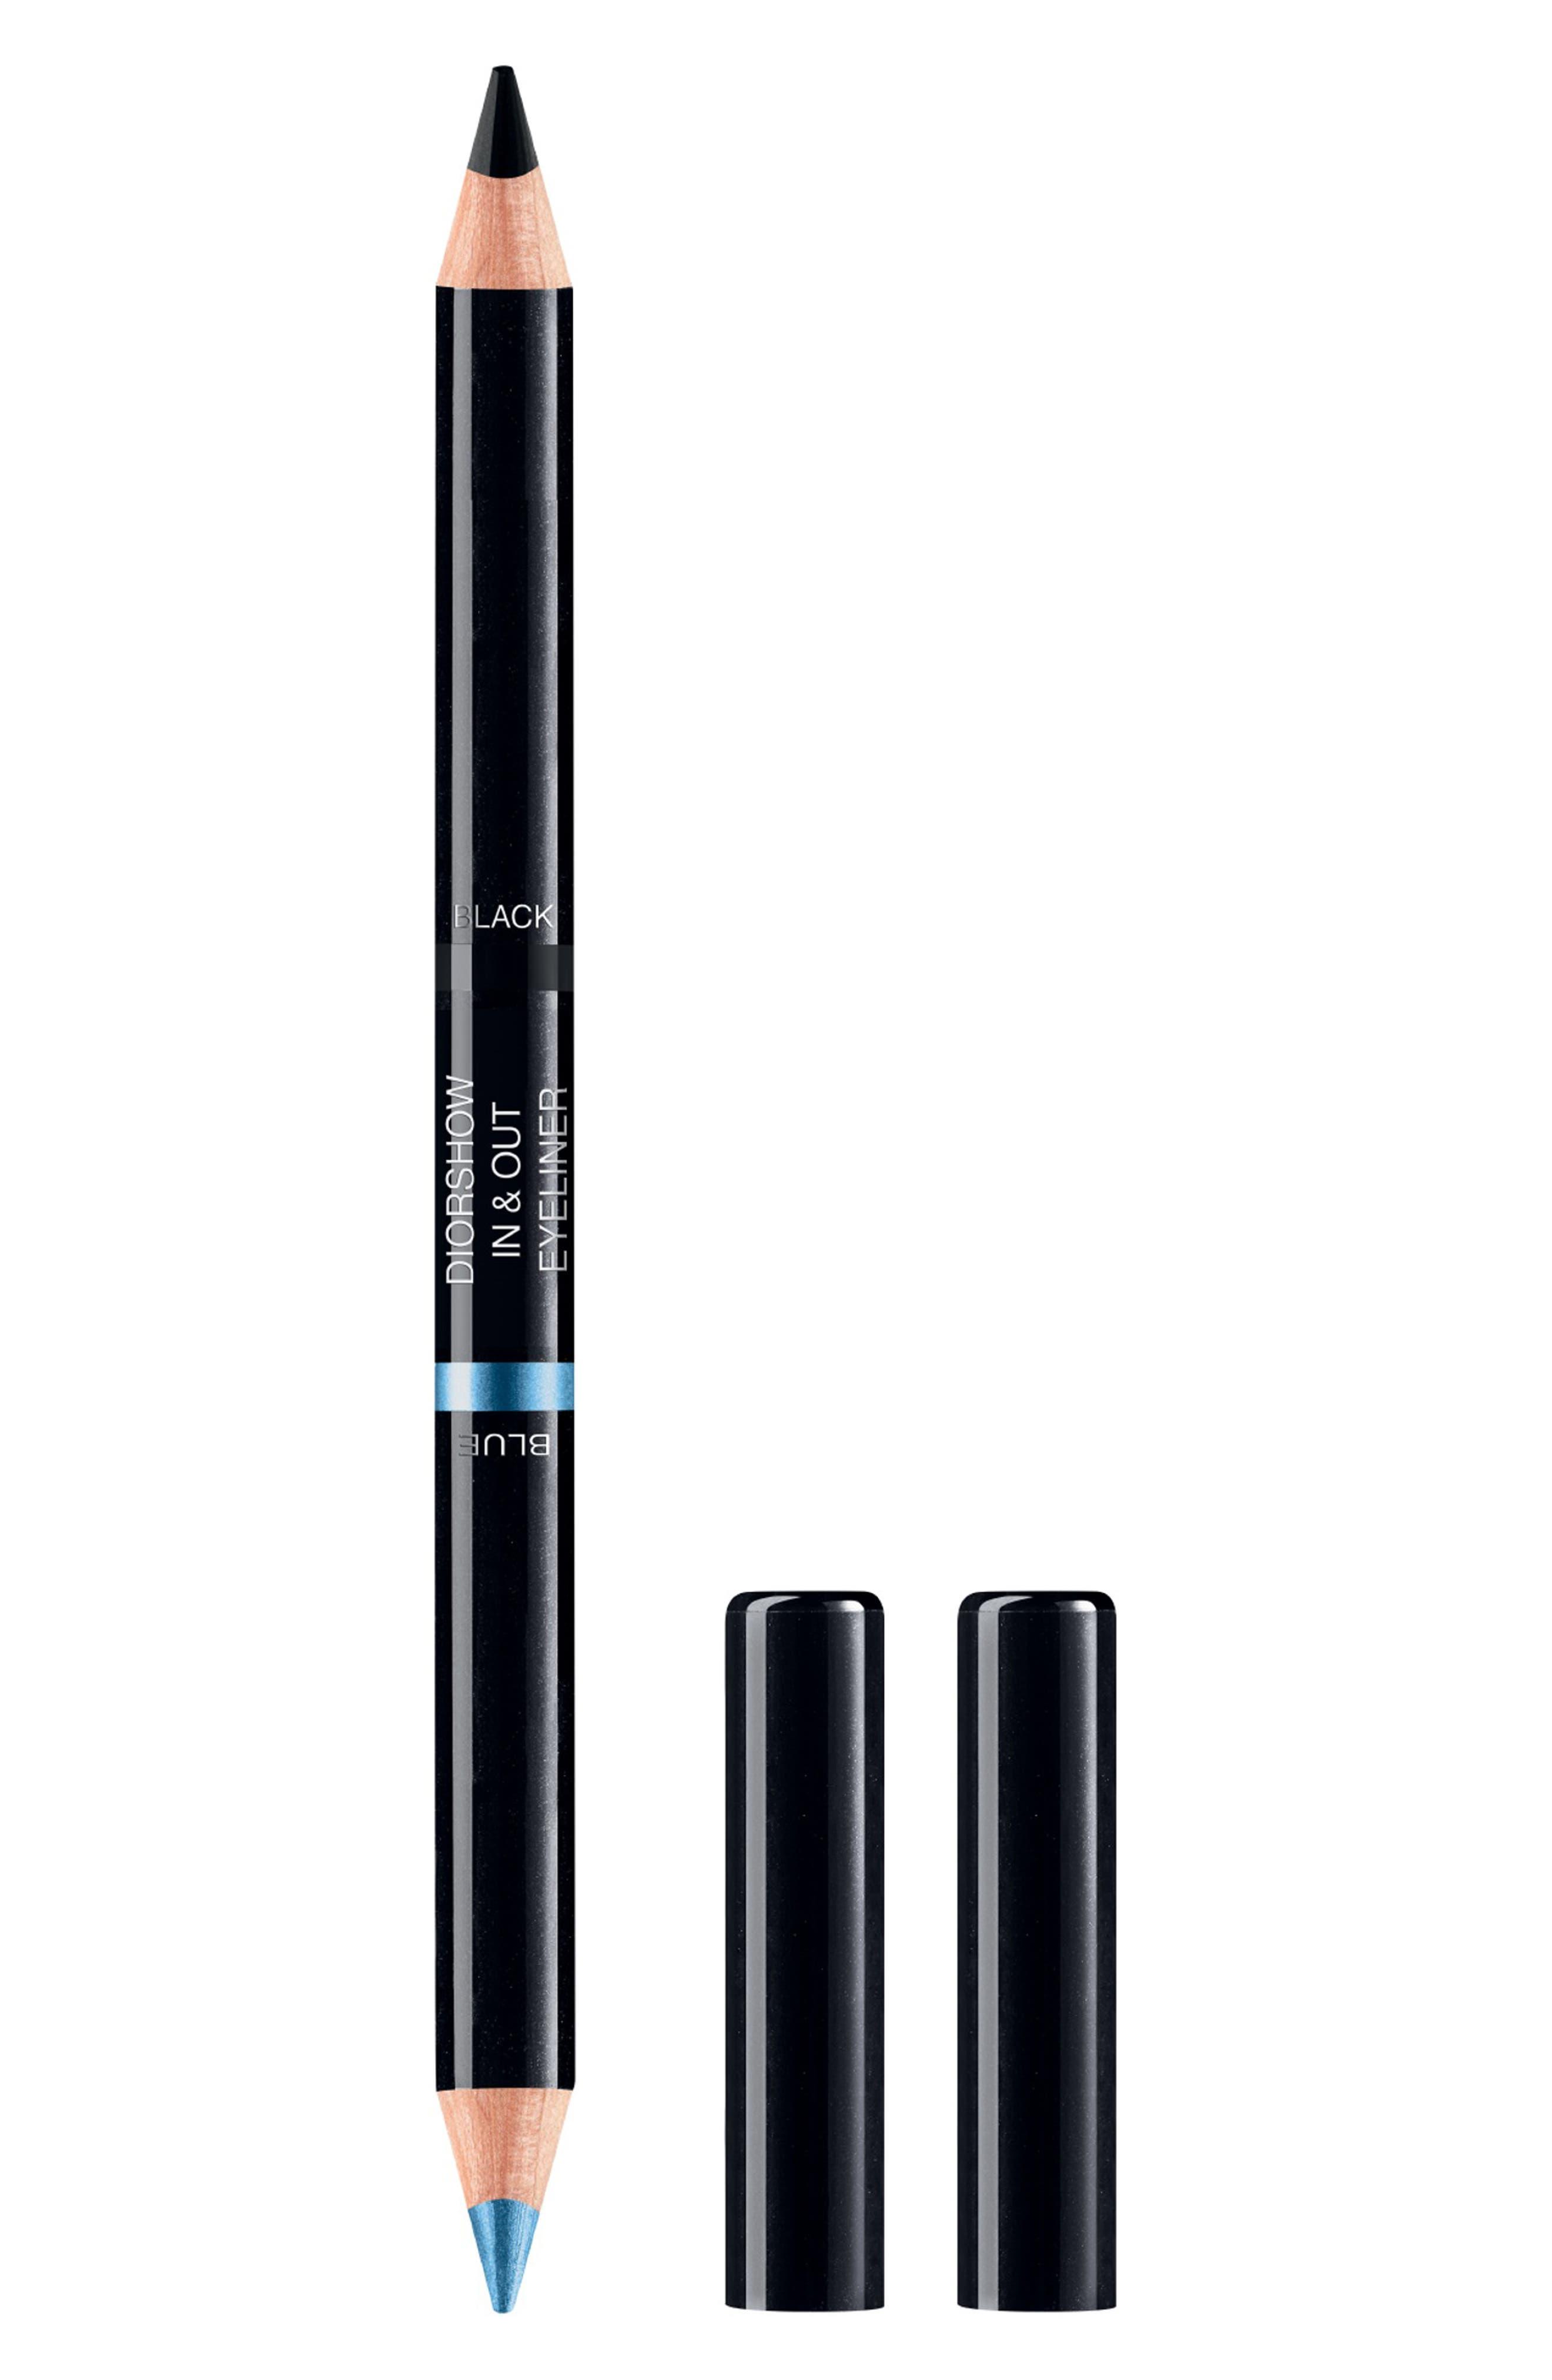 Dior Diorshow In & Out Waterproof Eyeliner - 001 Black/blue